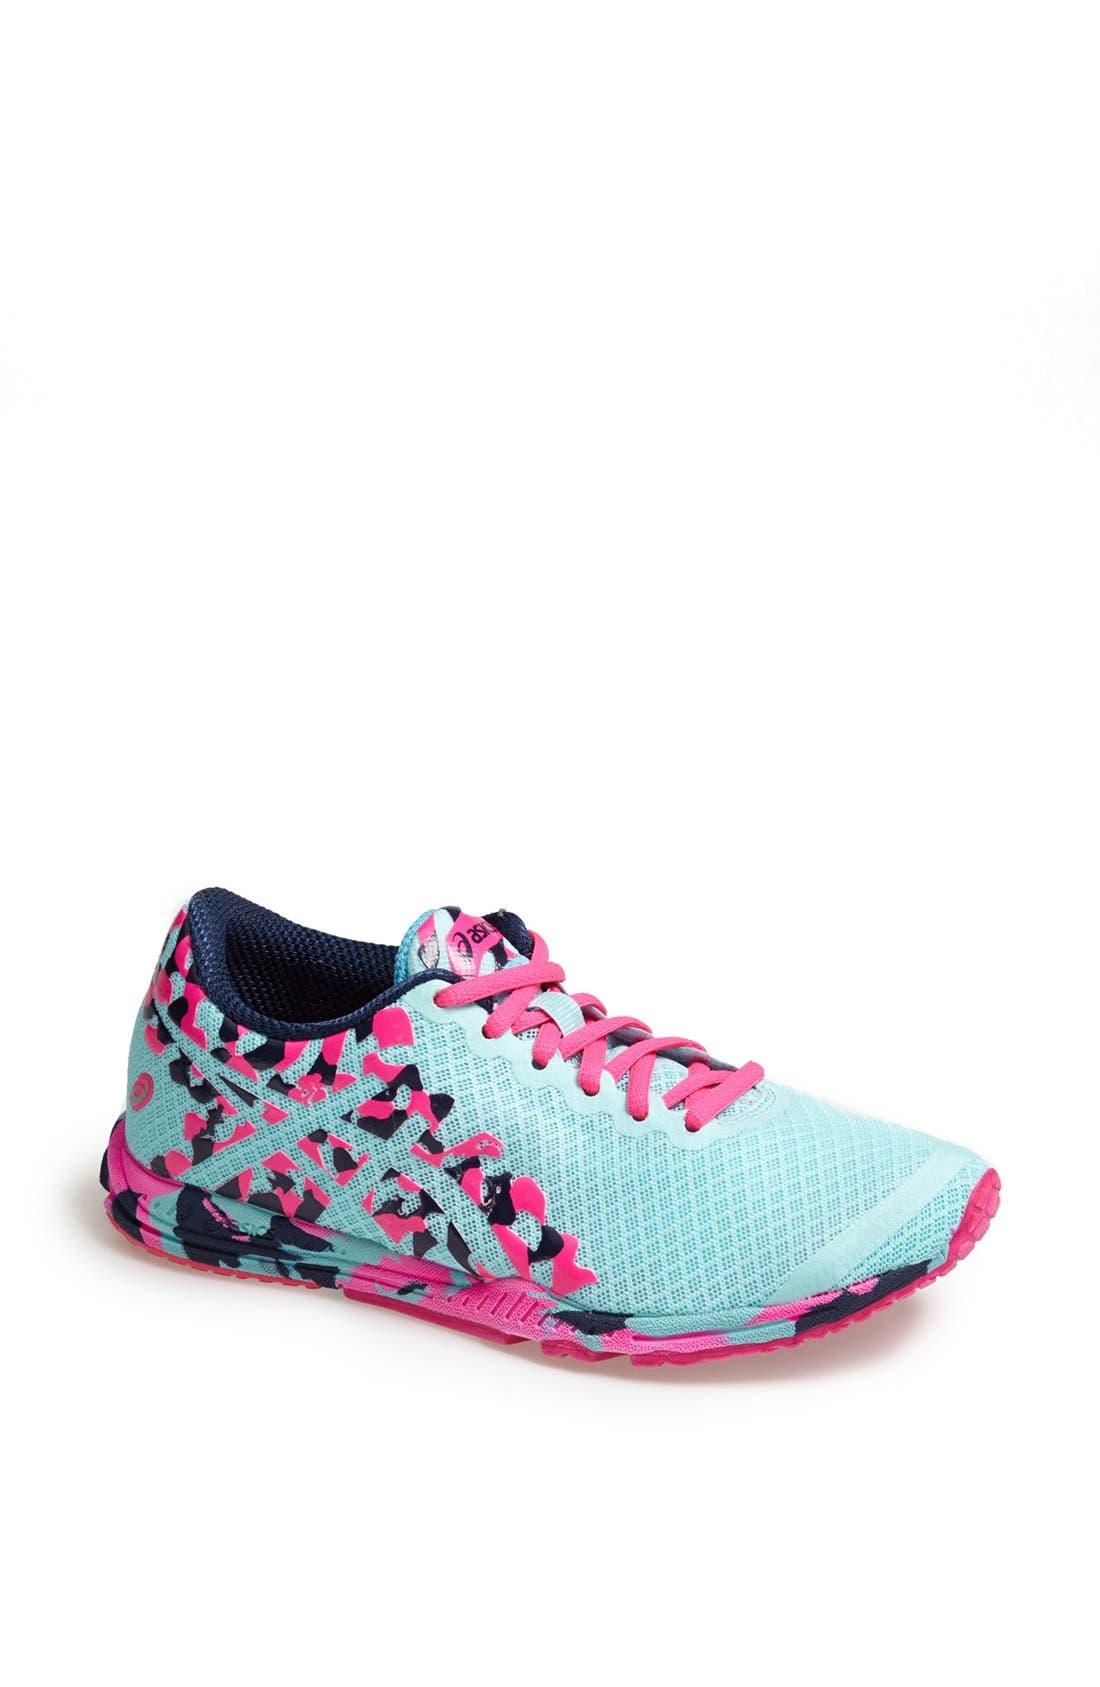 Alternate Image 1 Selected - ASICS® 'GEL-NoosaFast 2' Running Shoe (Women)